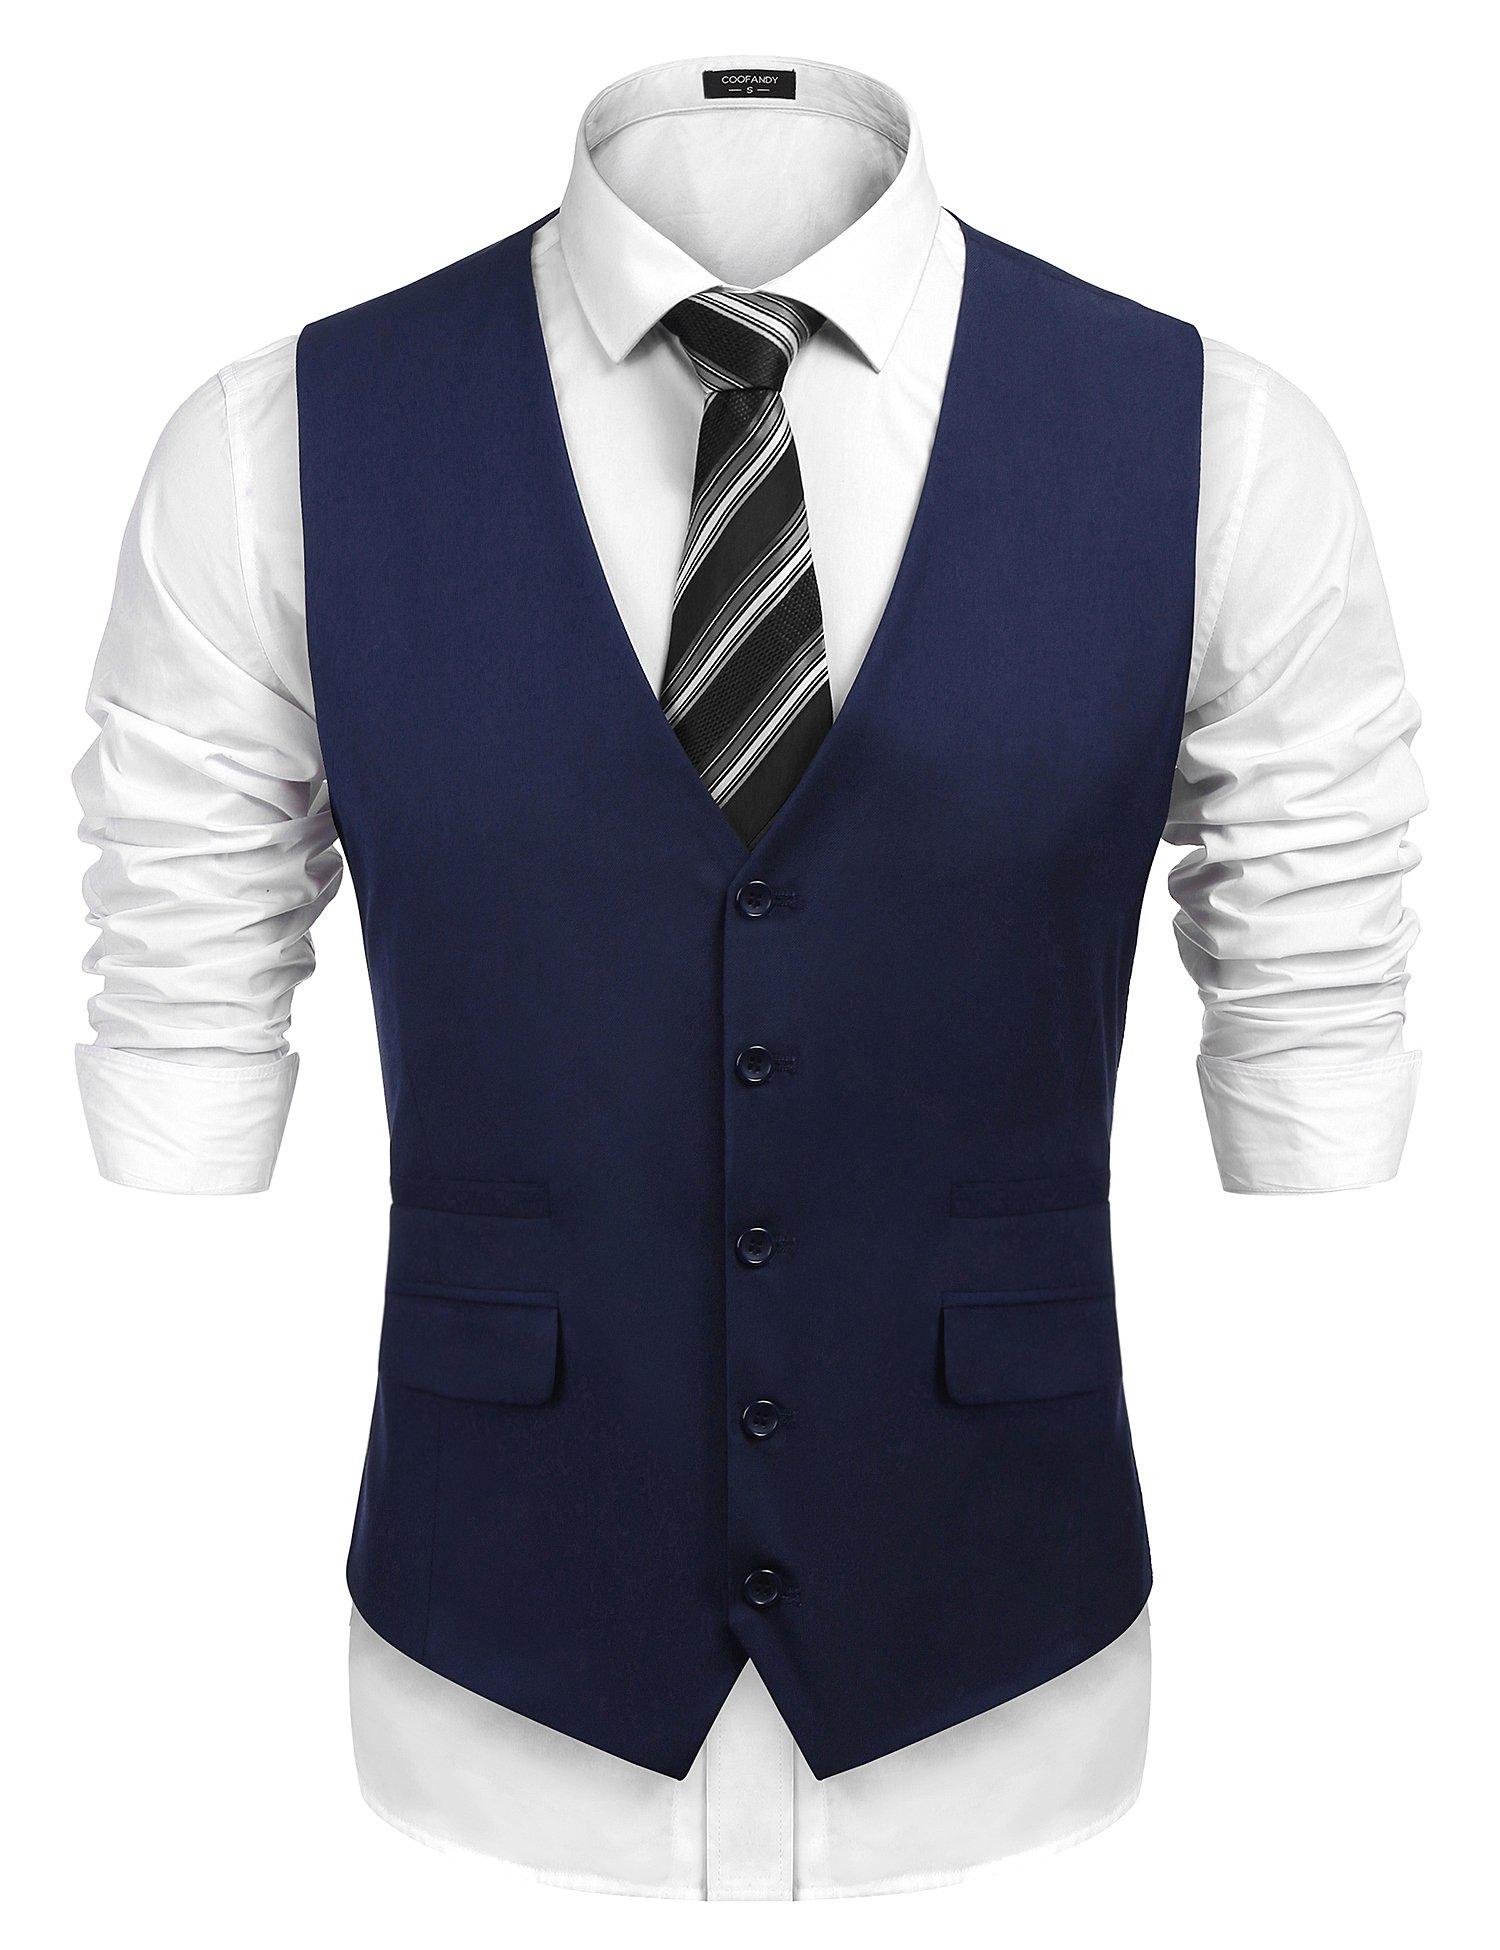 COOFANDY Men's Business Suit Vest,Slim Fit Formal Skinny Wedding Waistcoat,Navy Blue,Medium by COOFANDY